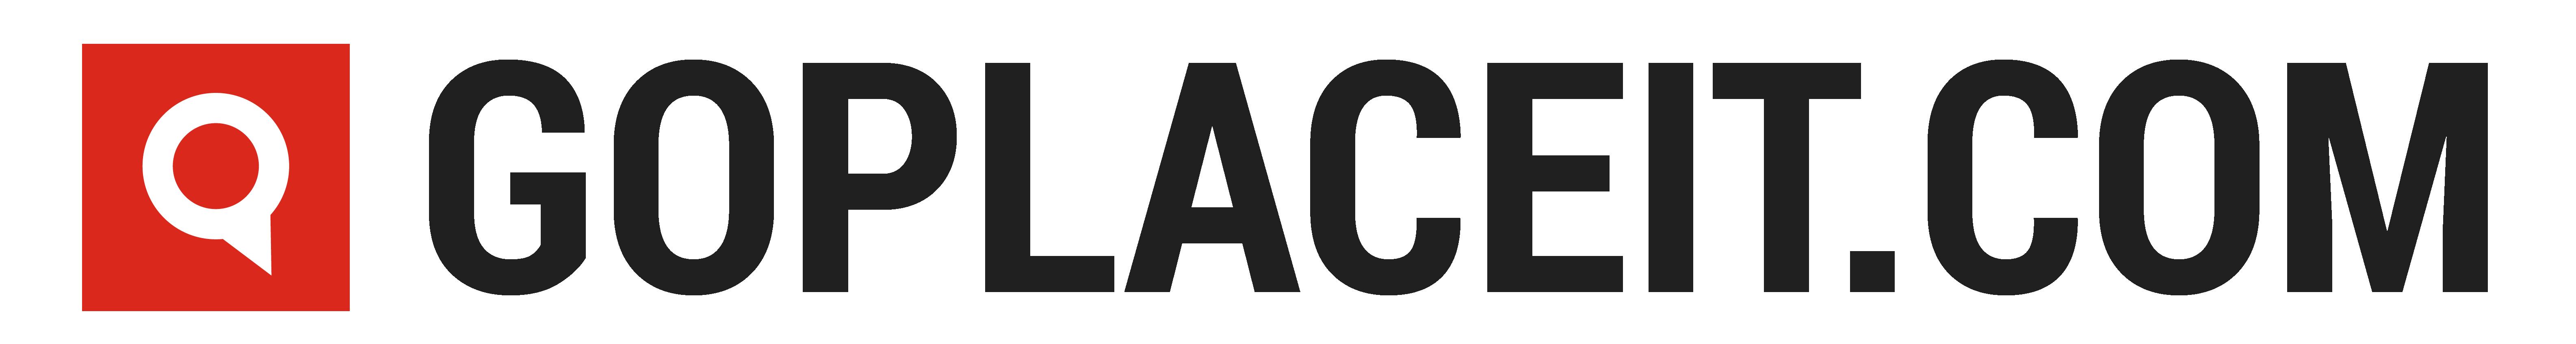 Logotipo Goplaceit.com